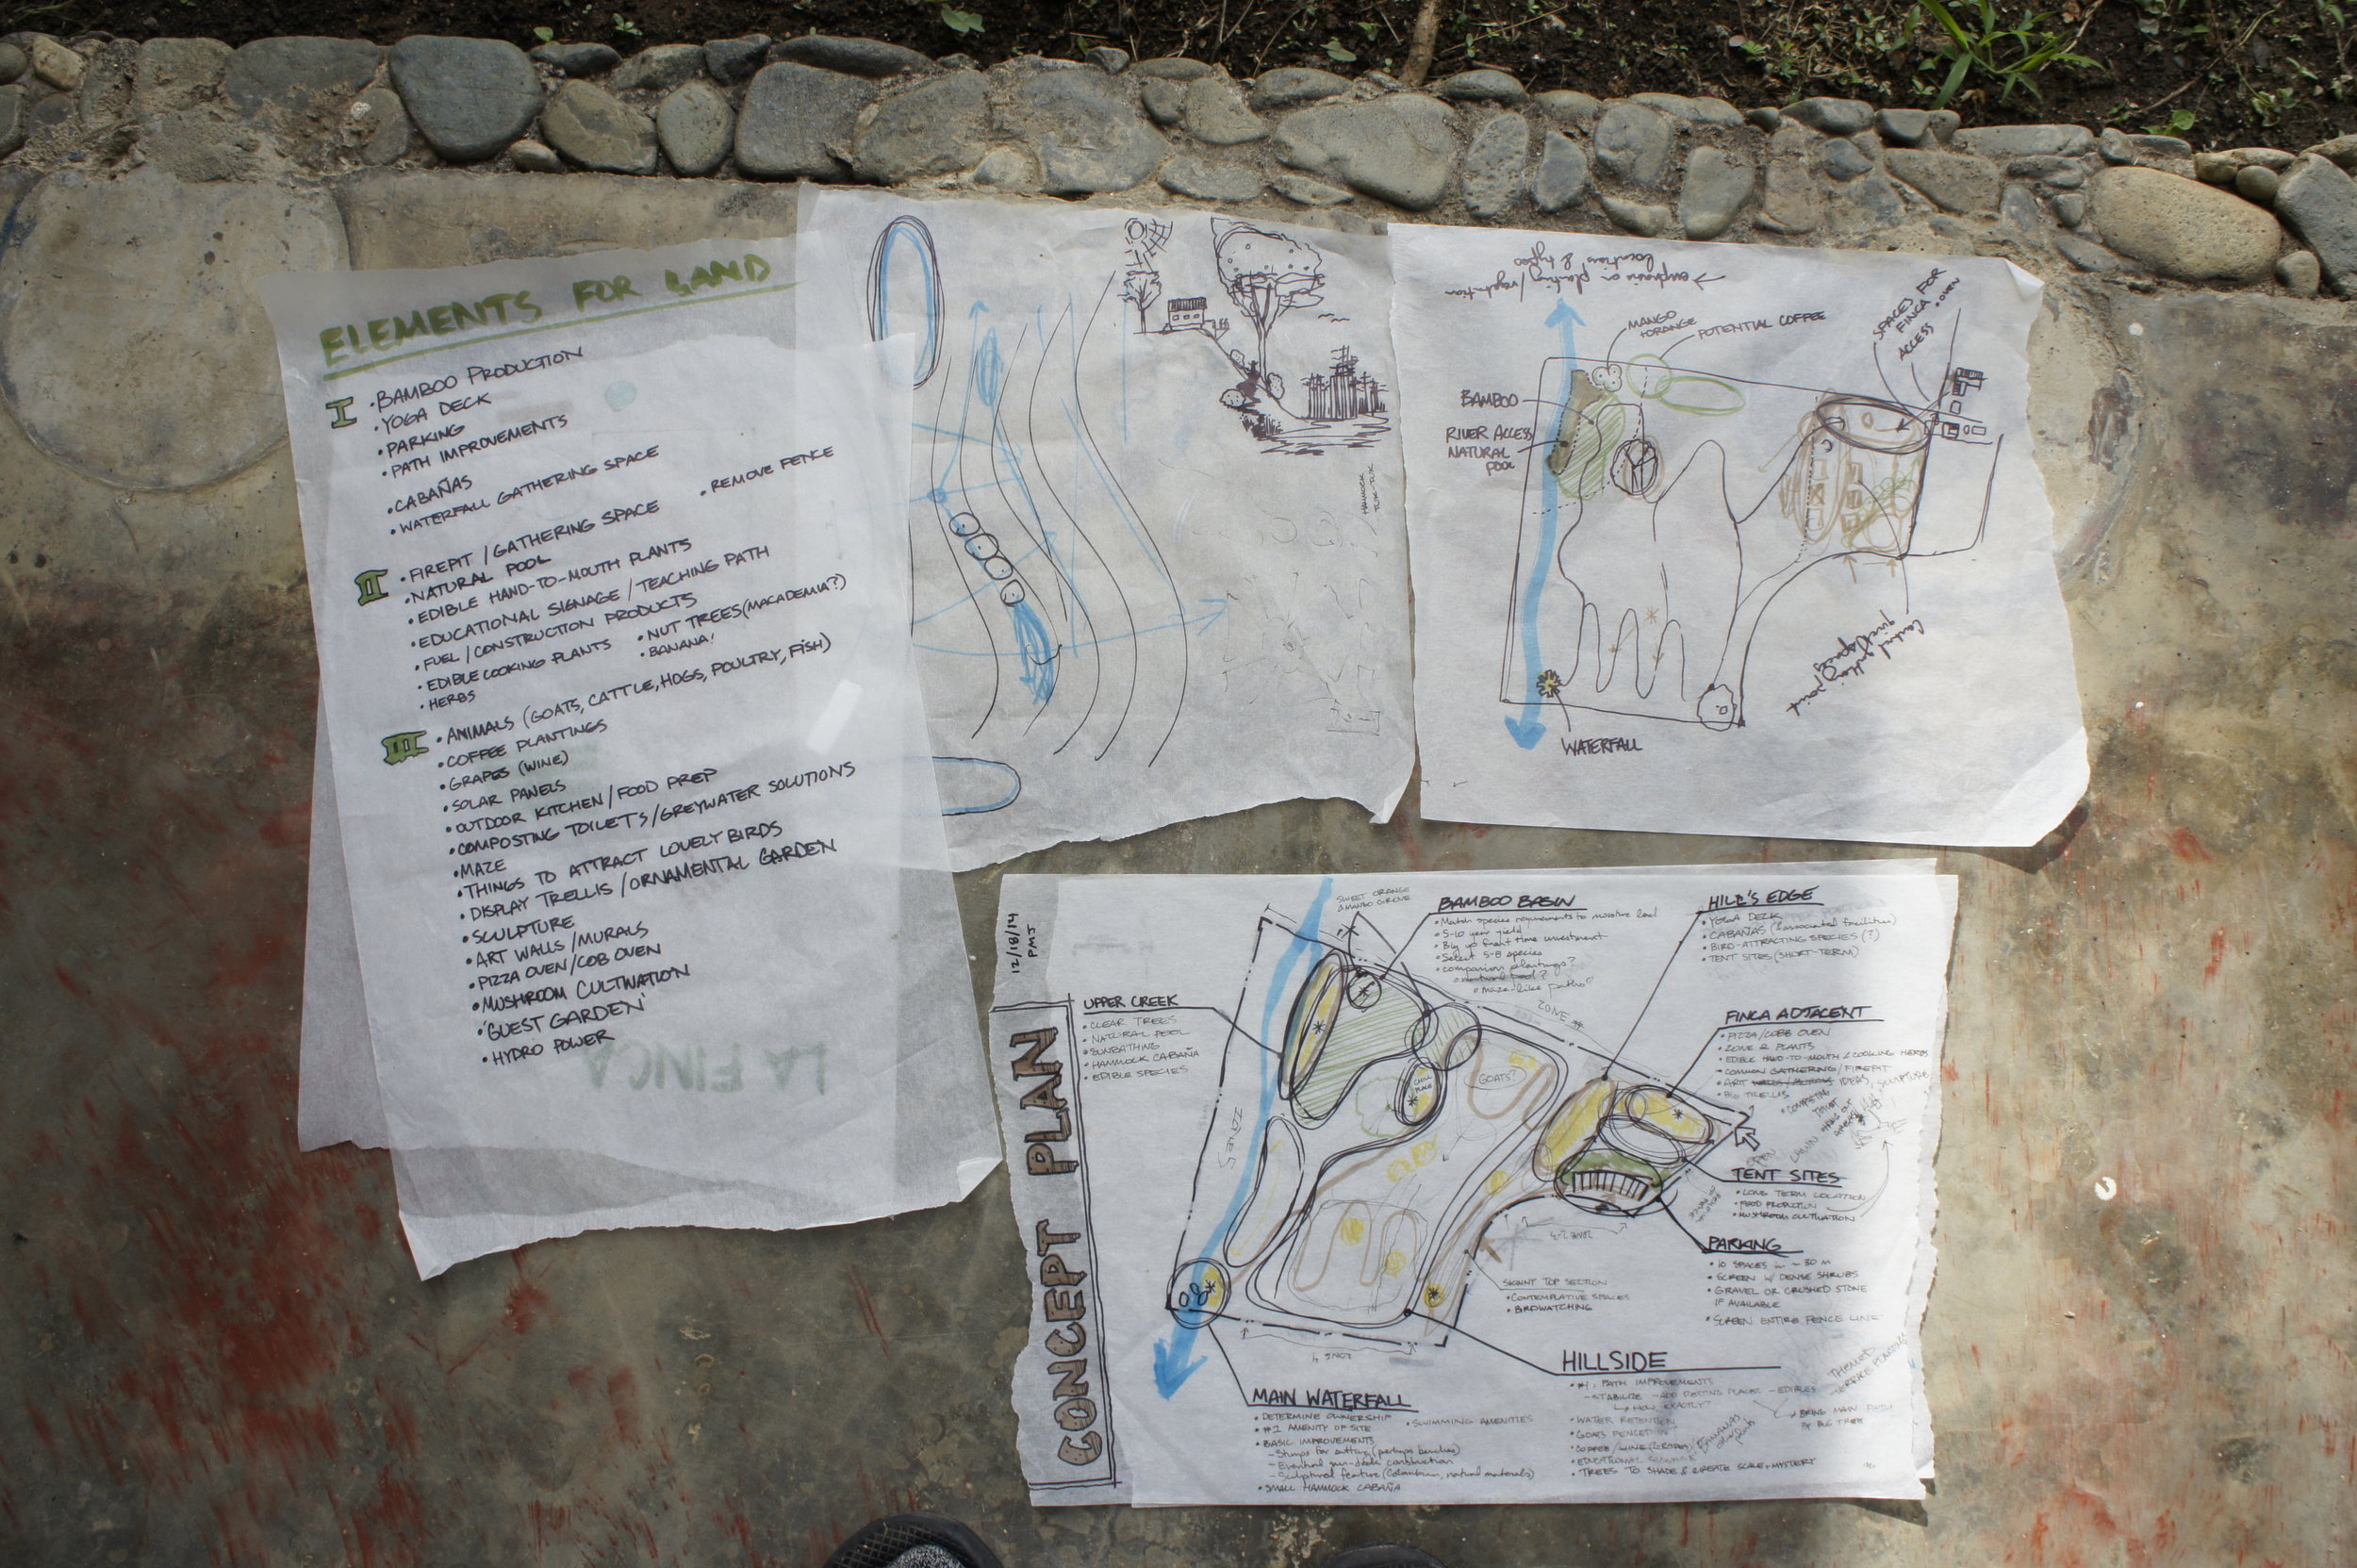 Concept development sketches